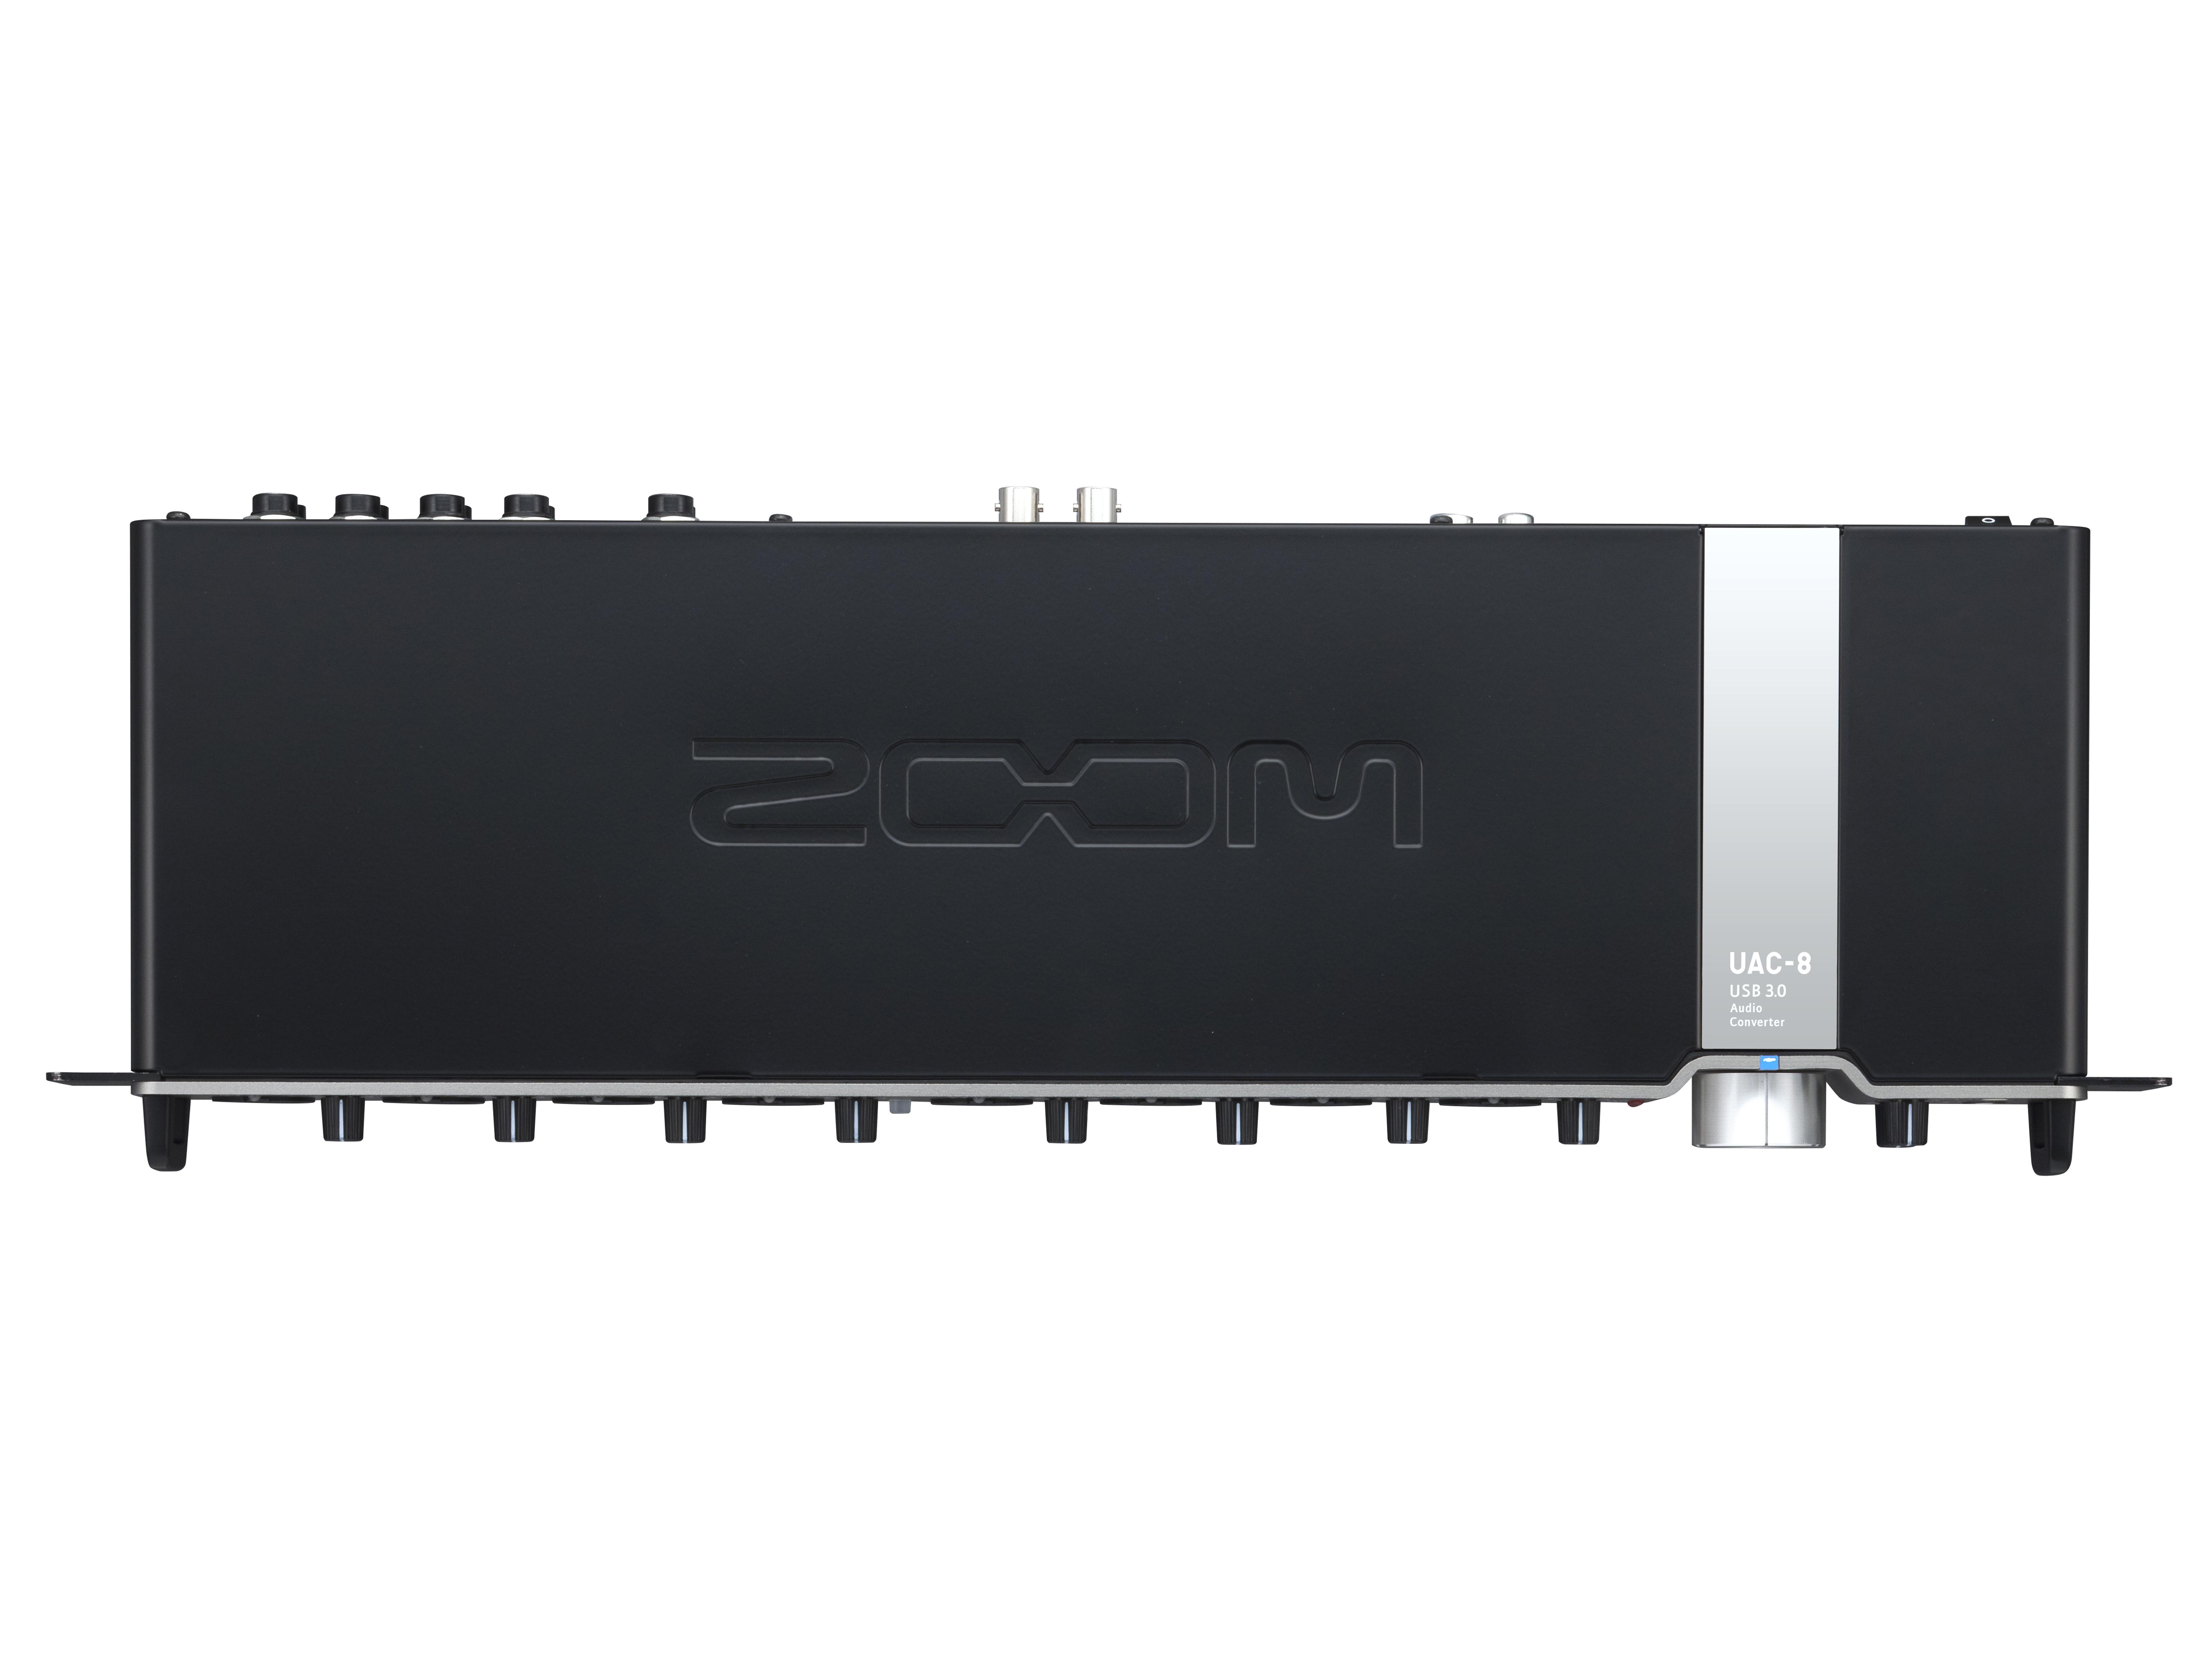 Uac 8 Usb 30 Audio Converter Zoom Circuitdiagram Addaconvertercircuit Adconverter 16bitad Superspeed Convertor Top